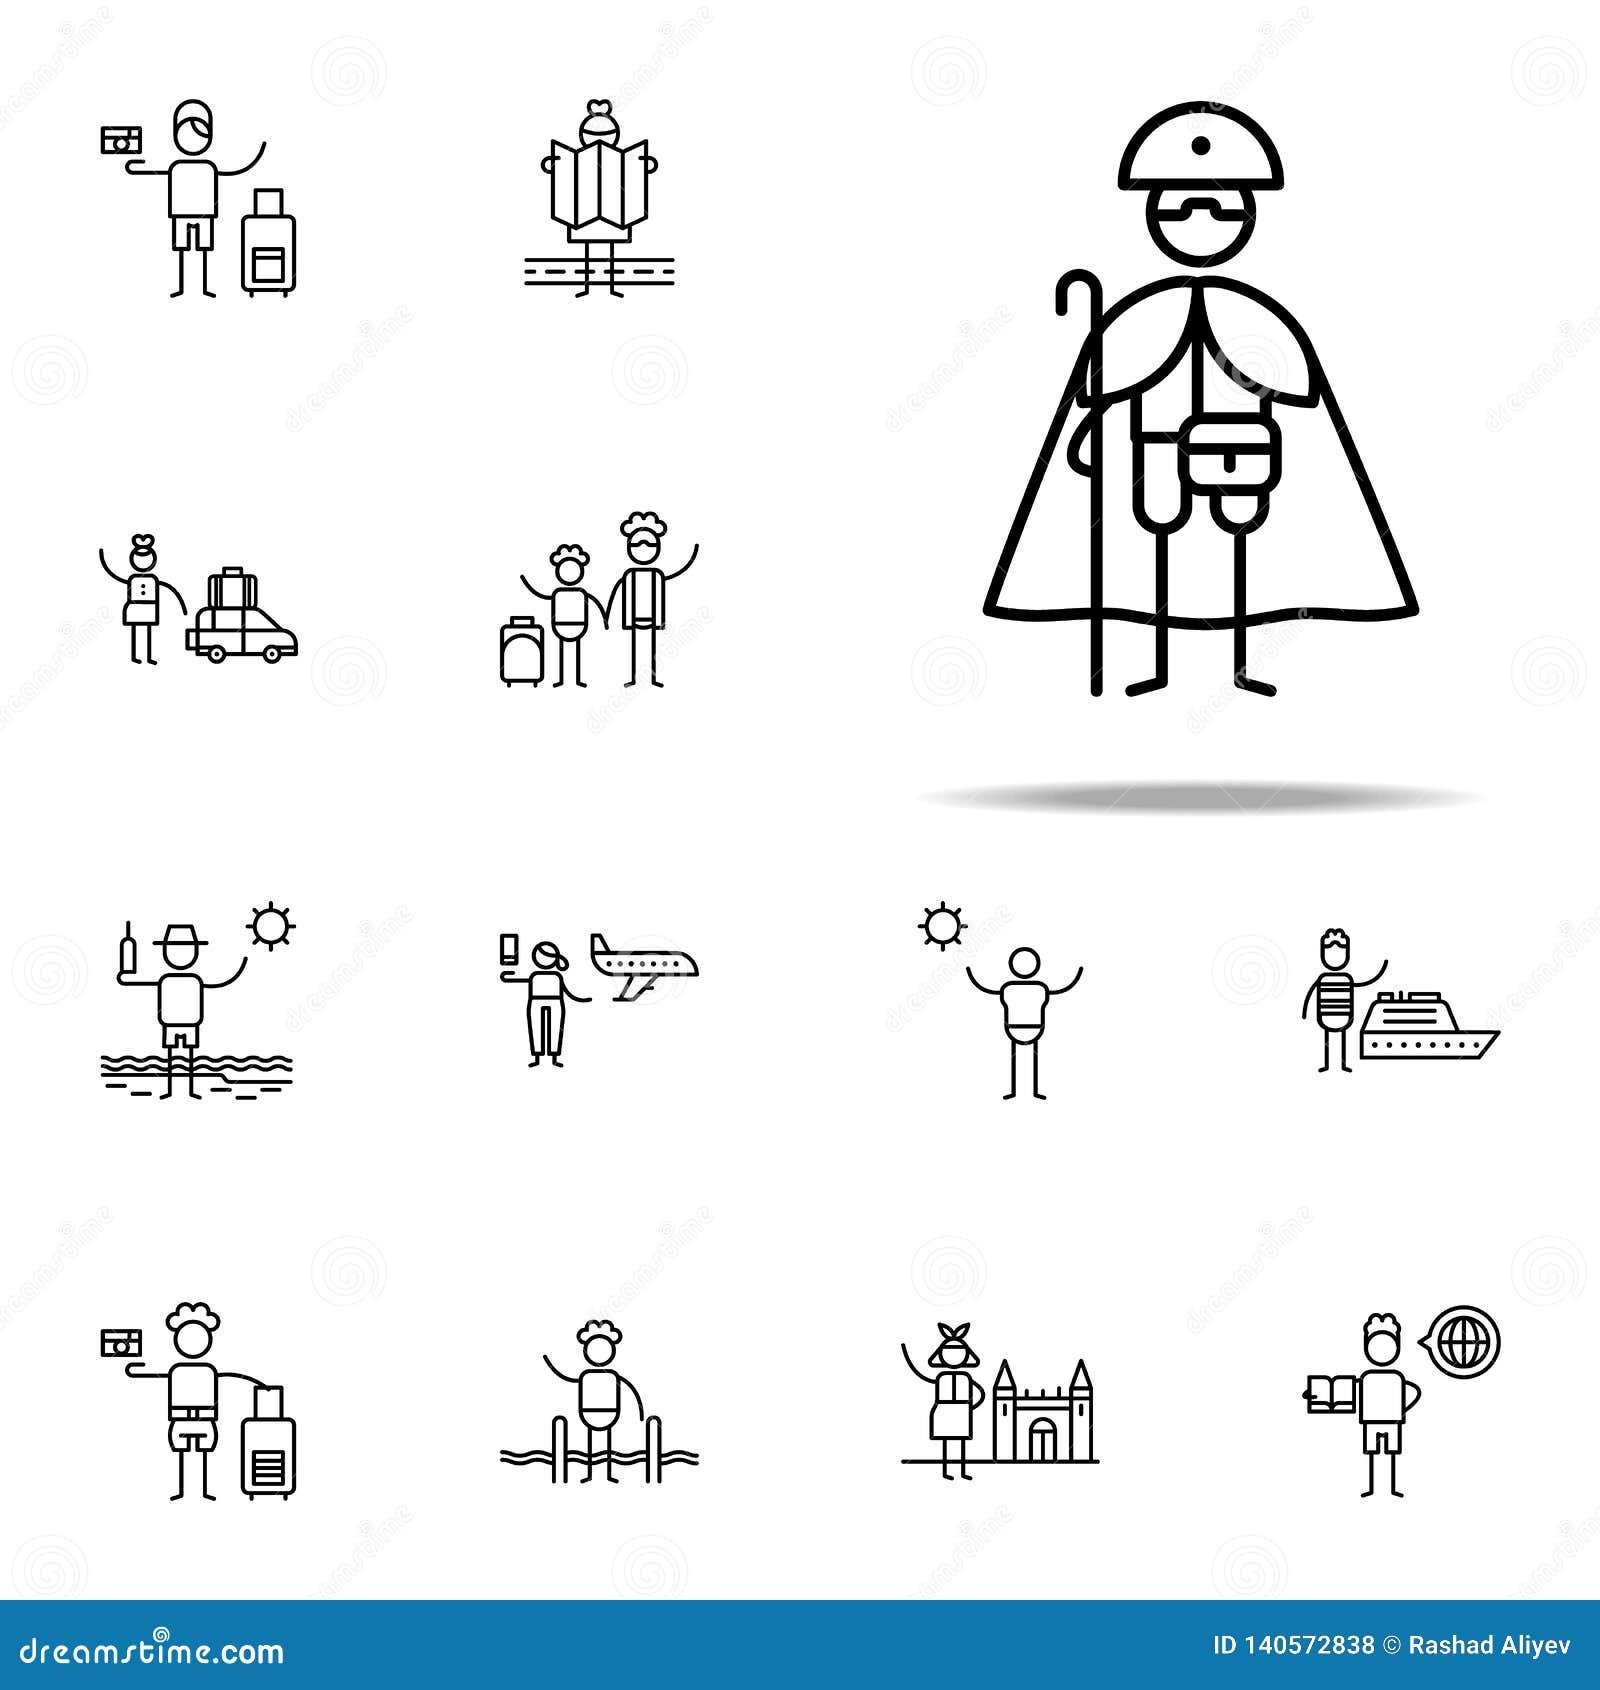 Pilgrim, Devotion icon. Travel icons universal set for web and mobile